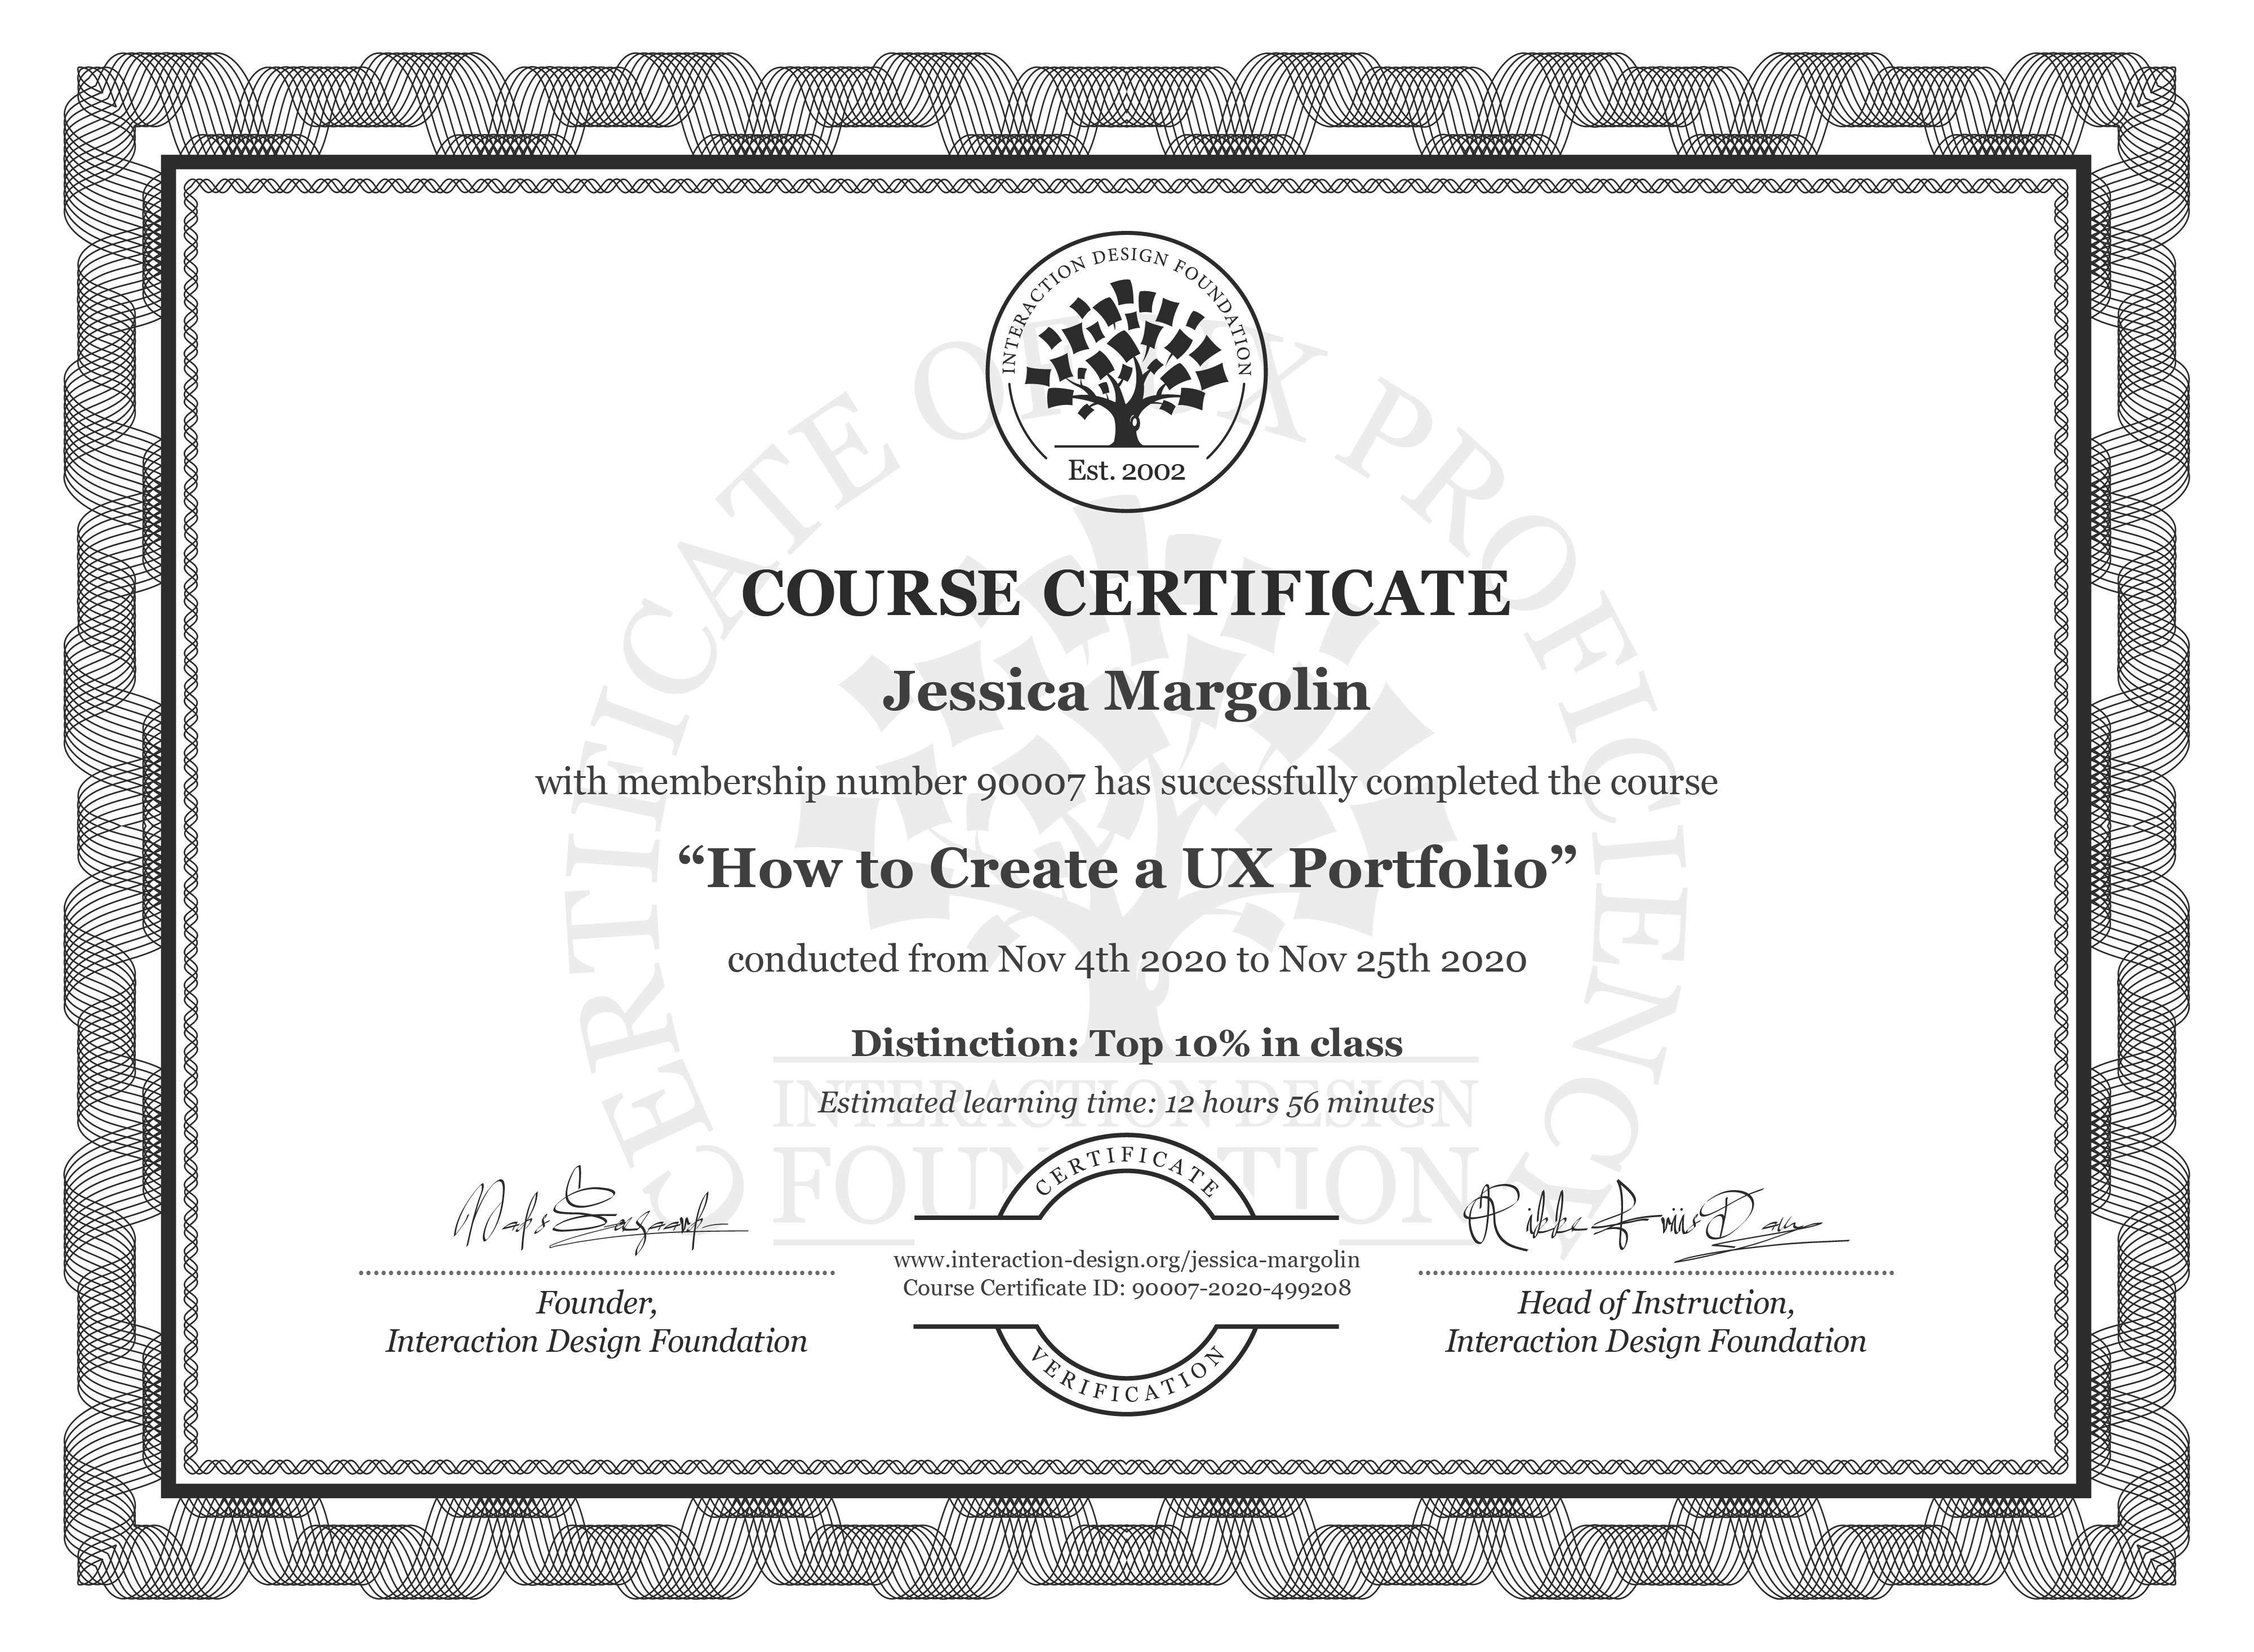 Jessica Margolin's Course Certificate: How to Create a UX Portfolio